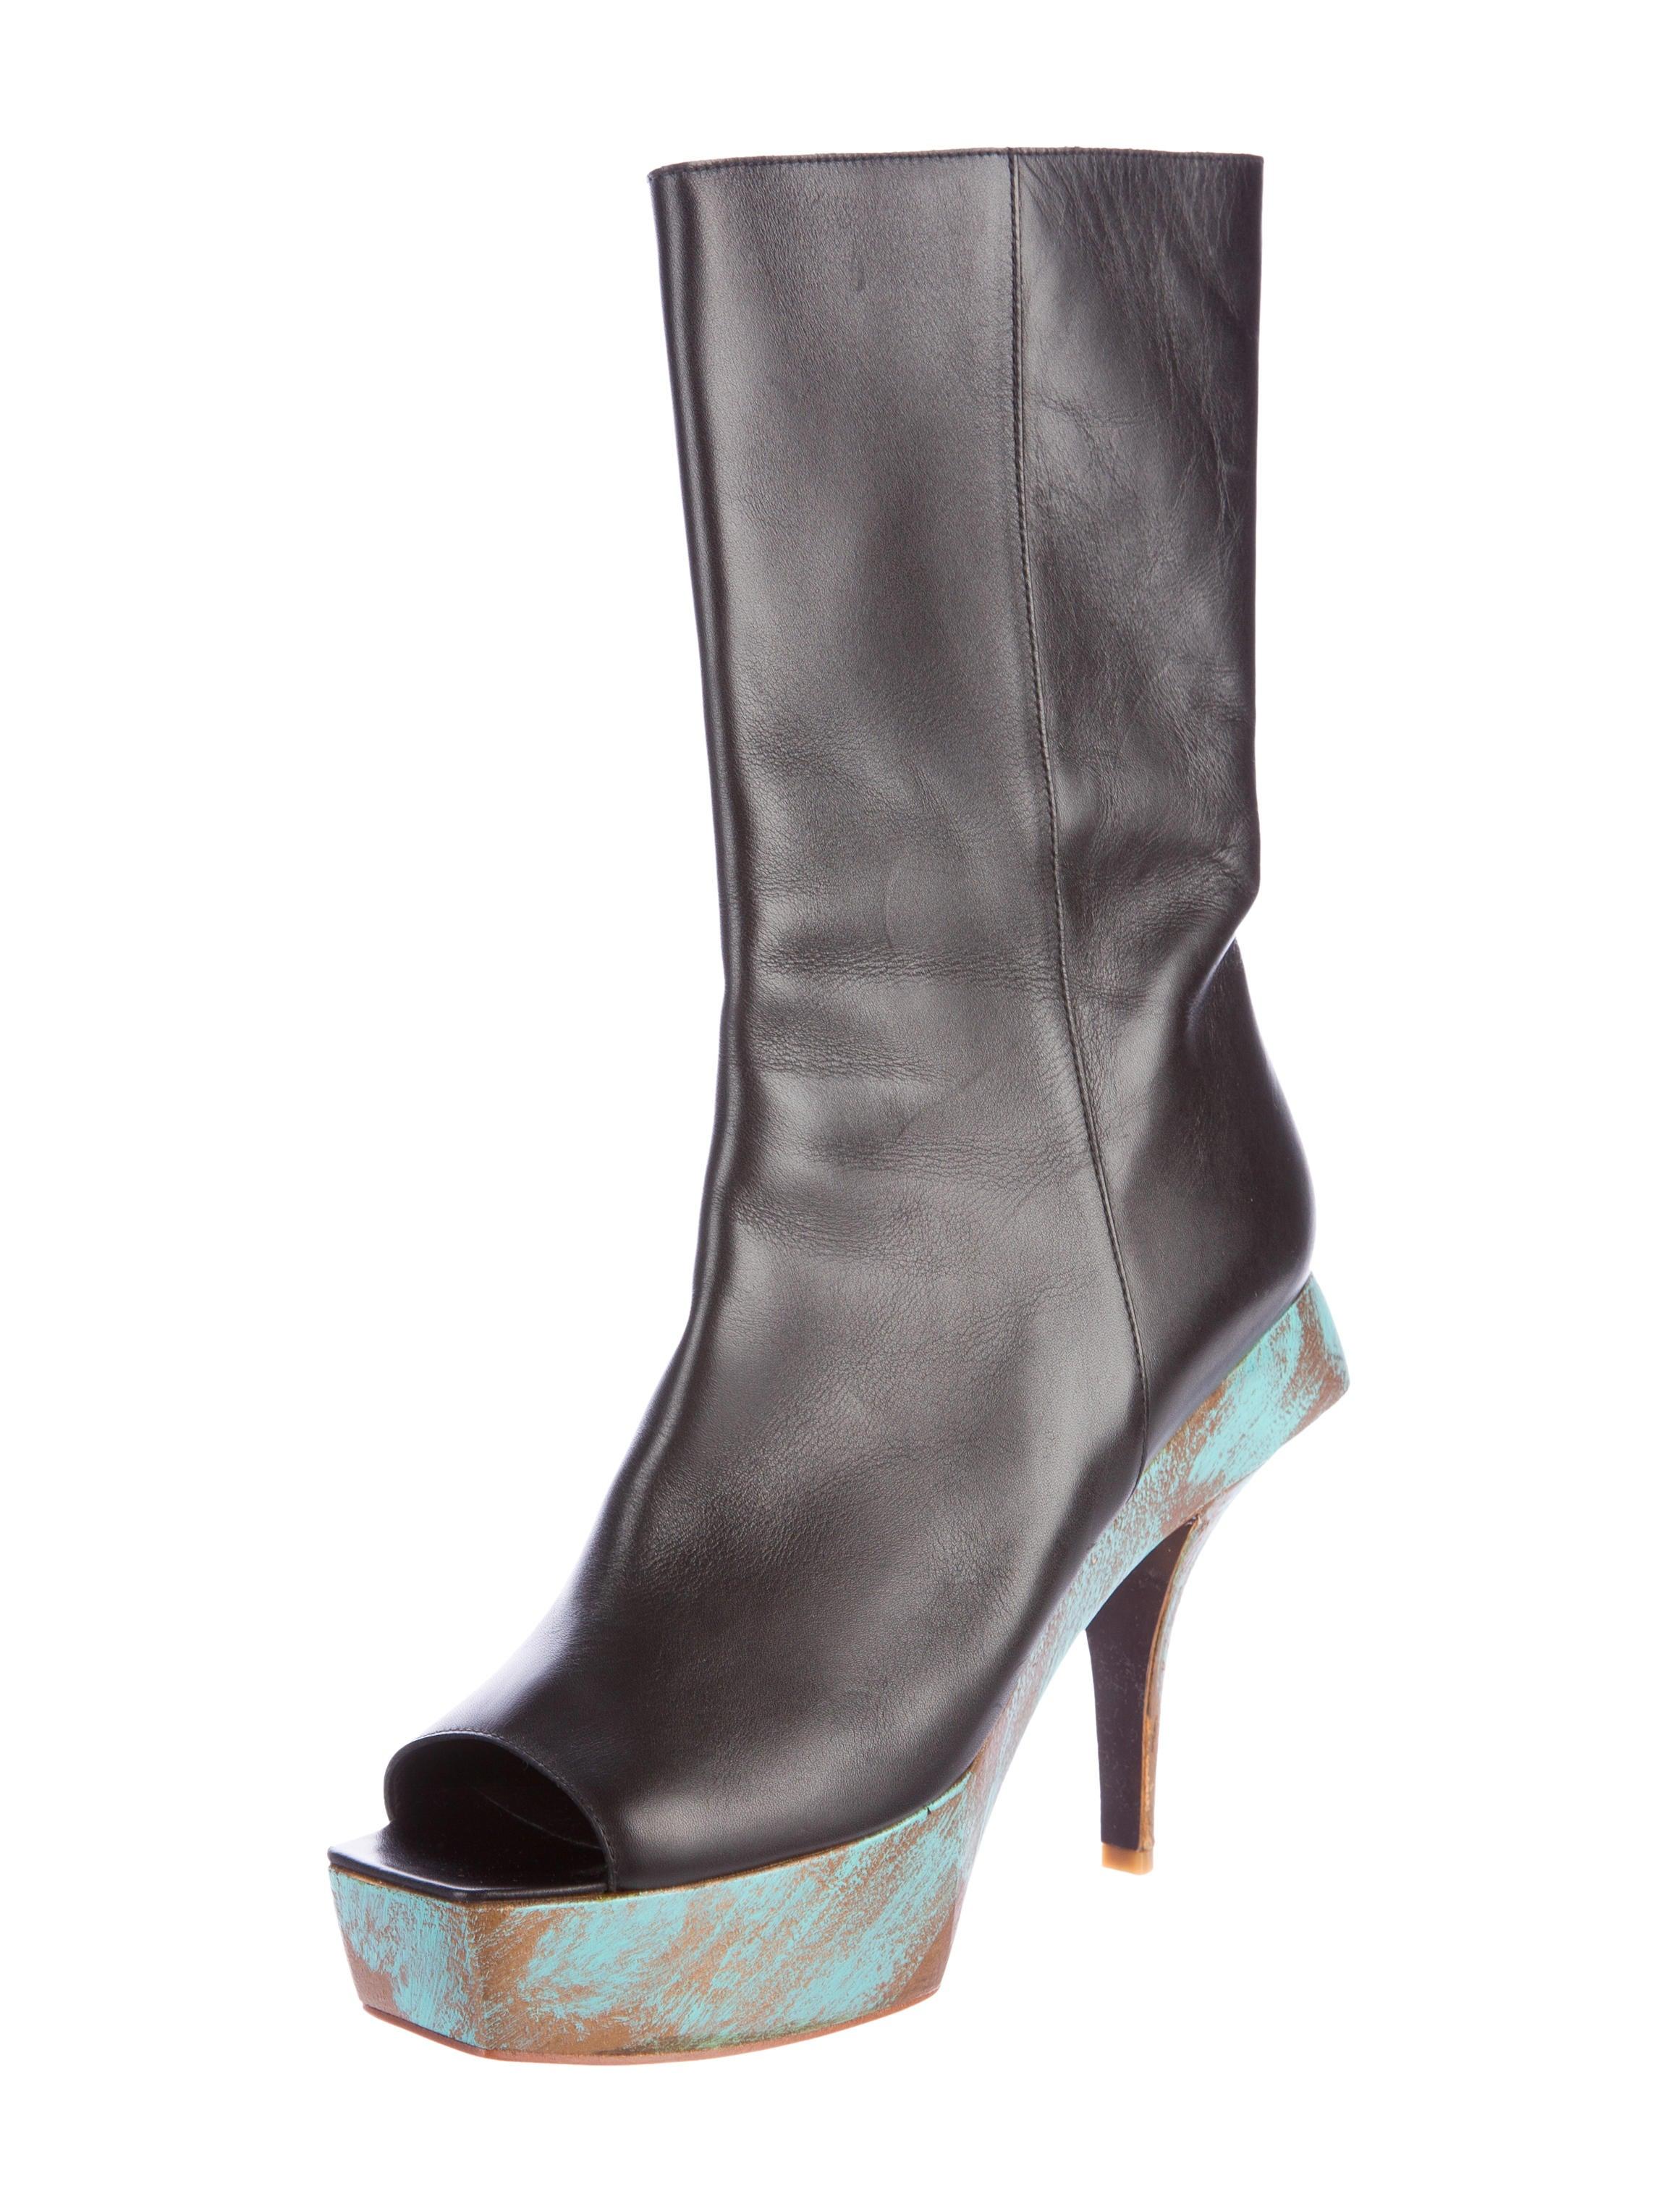 chanel platform peep toe ankle boots shoes cha185225